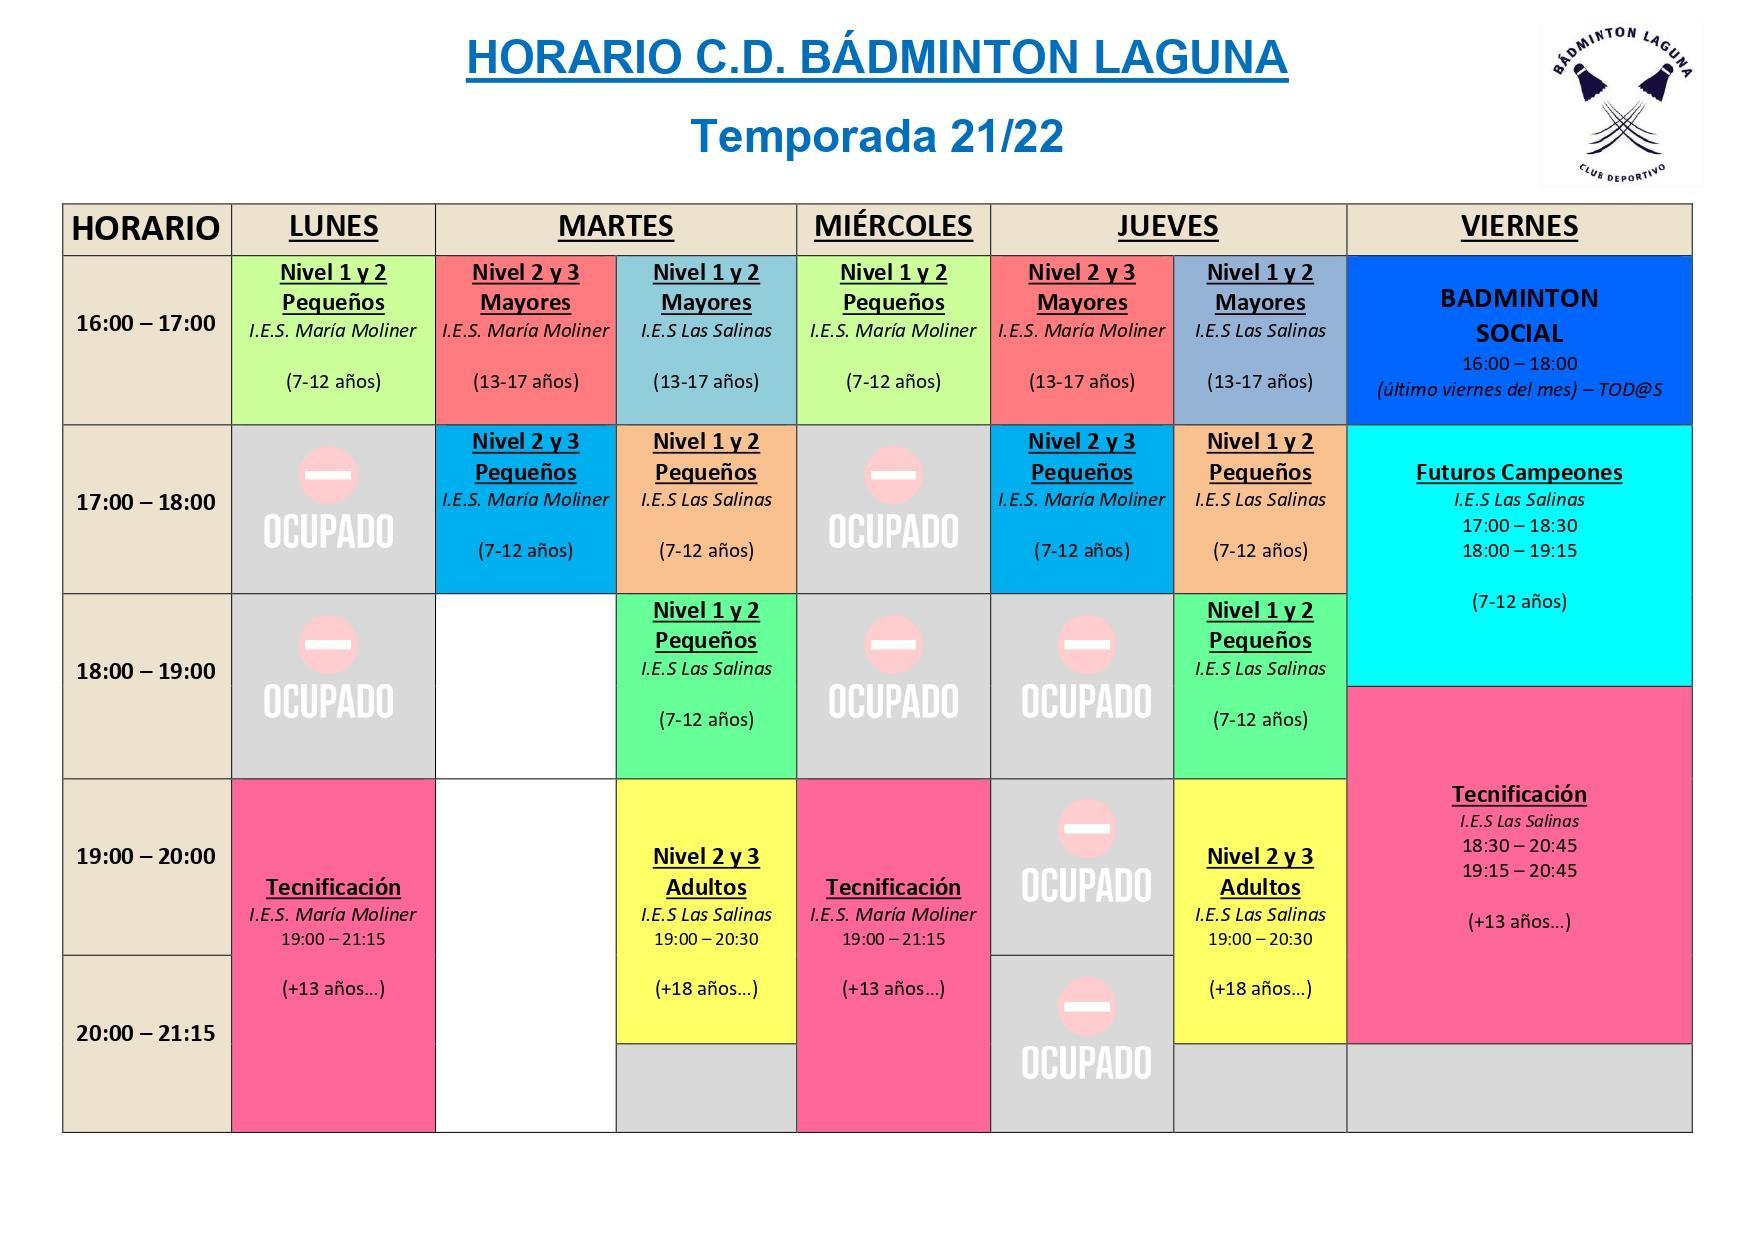 Horario c d badminton laguna 21 22 final